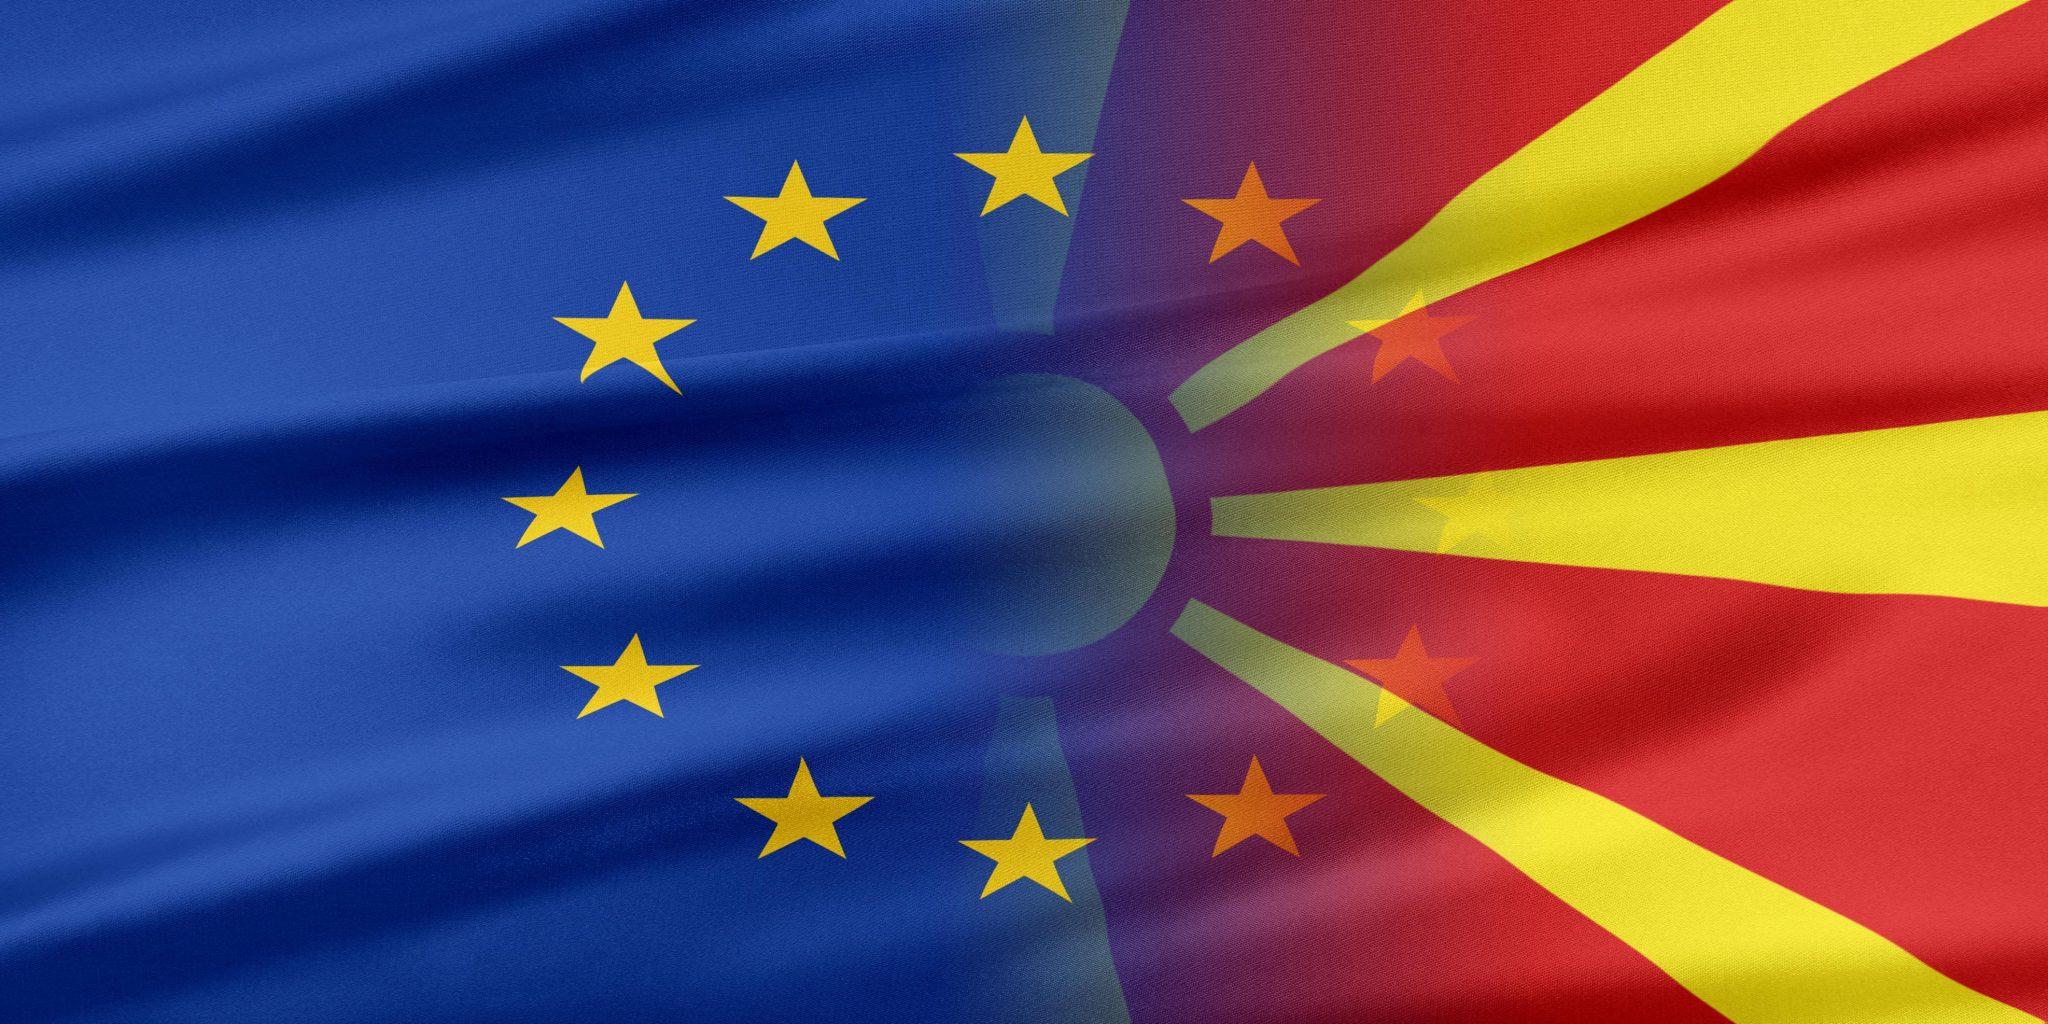 BiEPAG's Experts React: EC 2021 Progress Report on North Macedonia